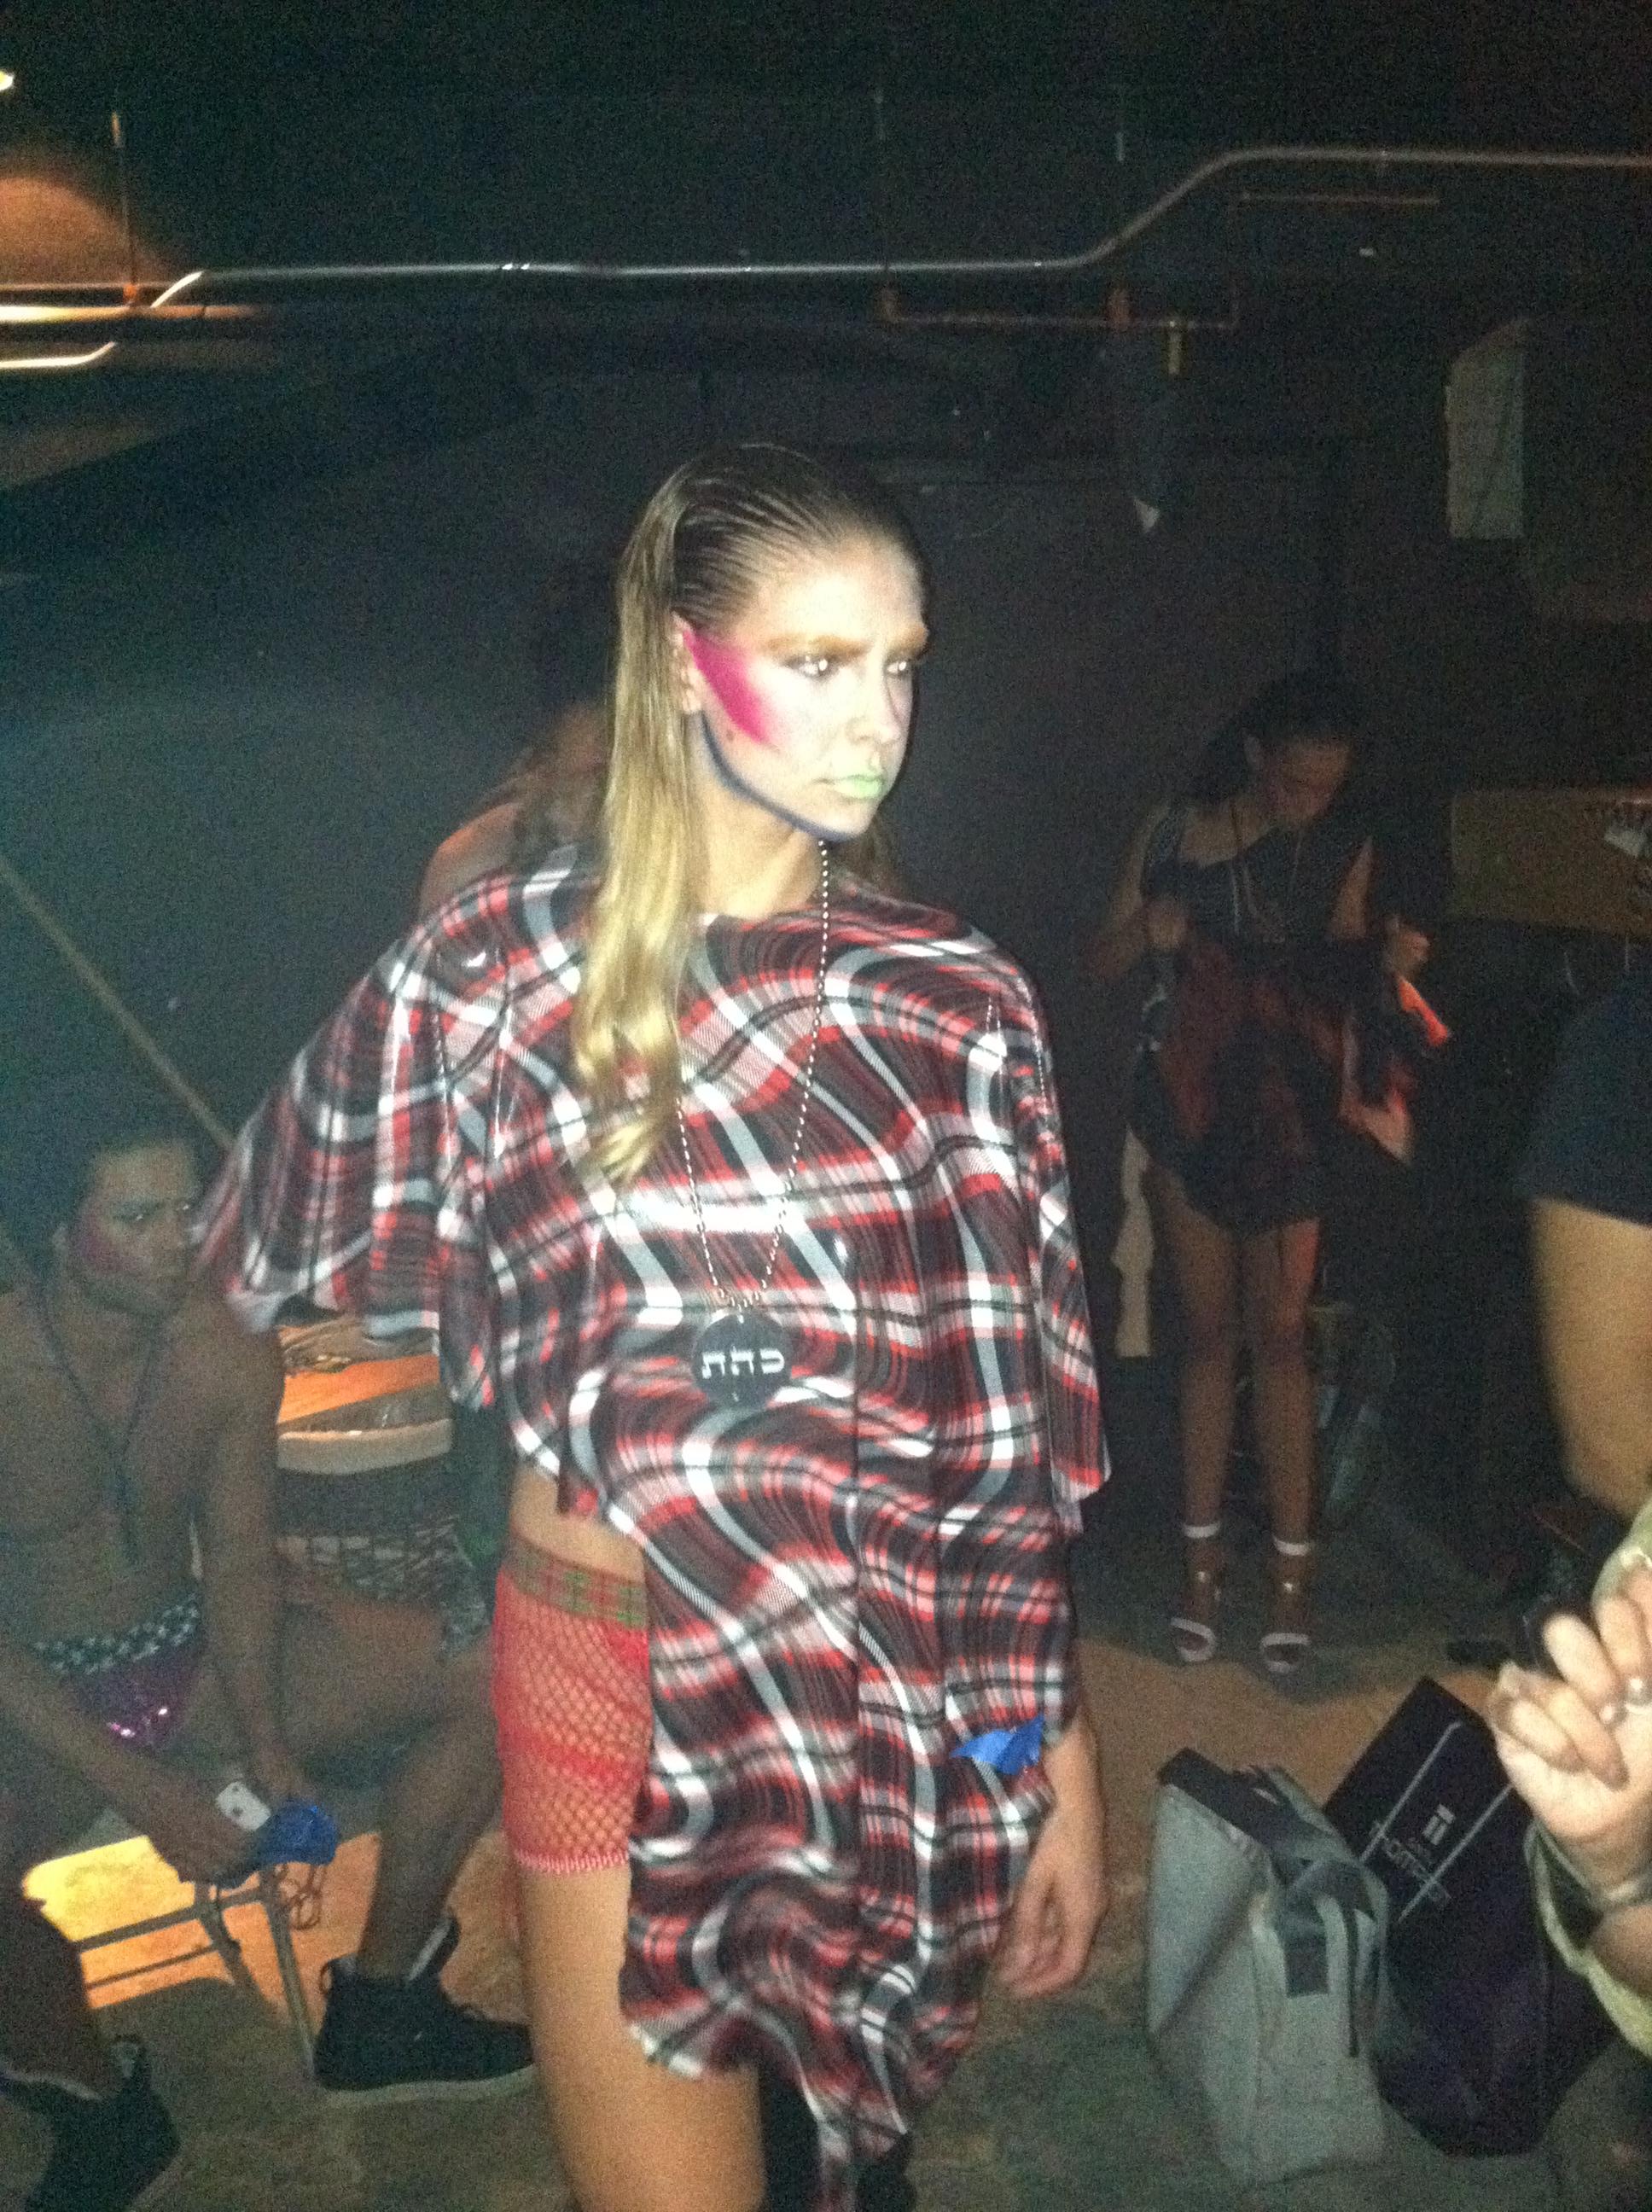 September 16, 2011: Fashion show at One Oak, aluminum medallion necklace Dissolve Negativiy